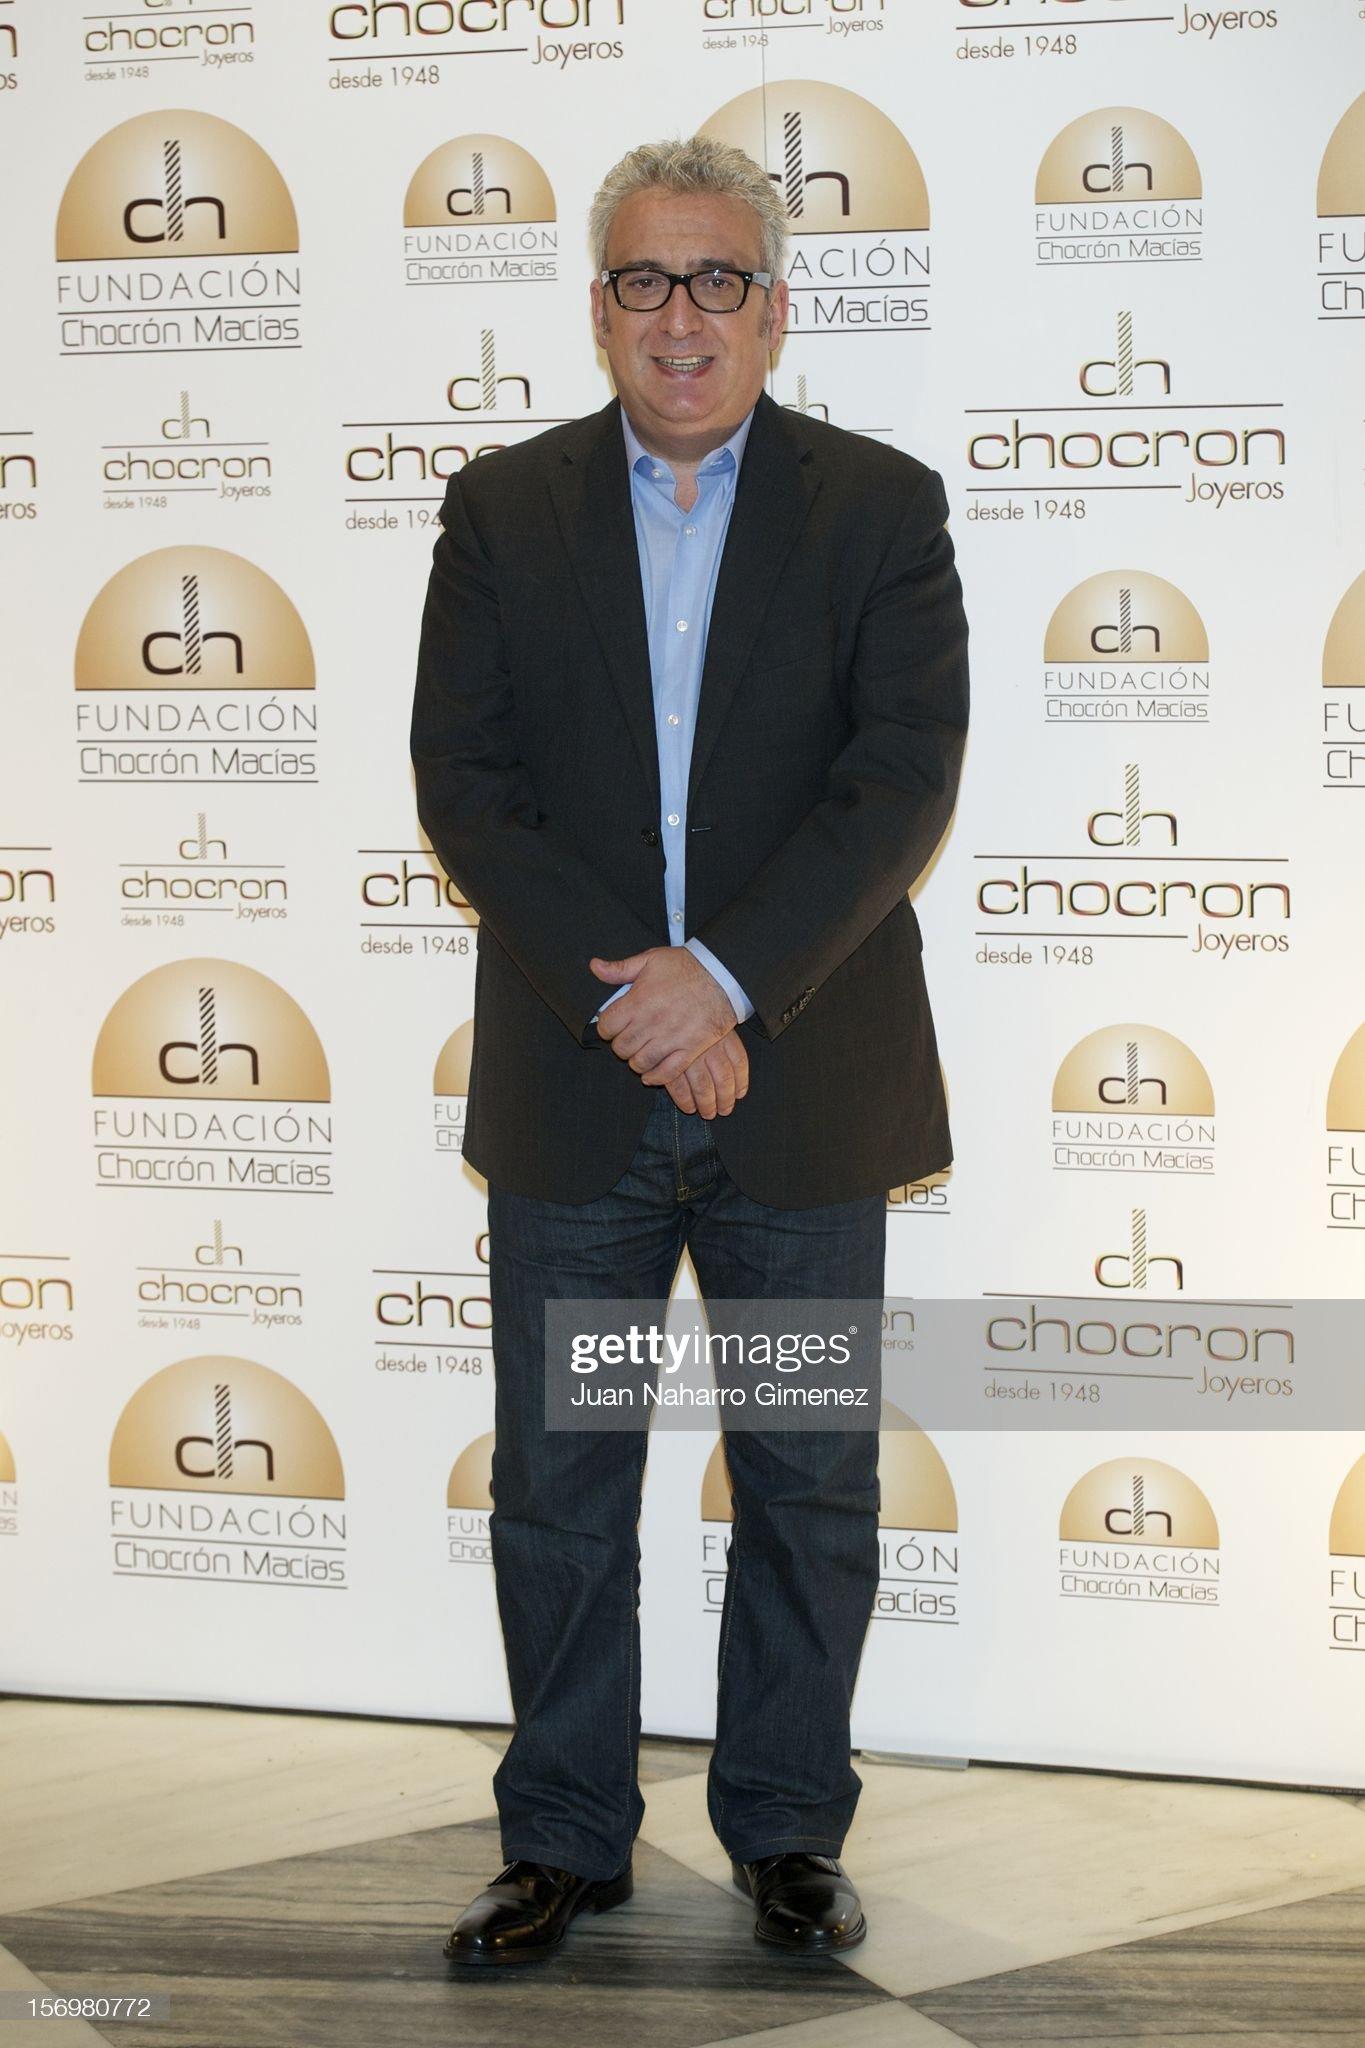 ¿Cuánto mide Leo Harlem? - Altura Leo-harlem-attends-chocron-jewelry-catalogue-presentation-at-teatriz-picture-id156980772?s=2048x2048